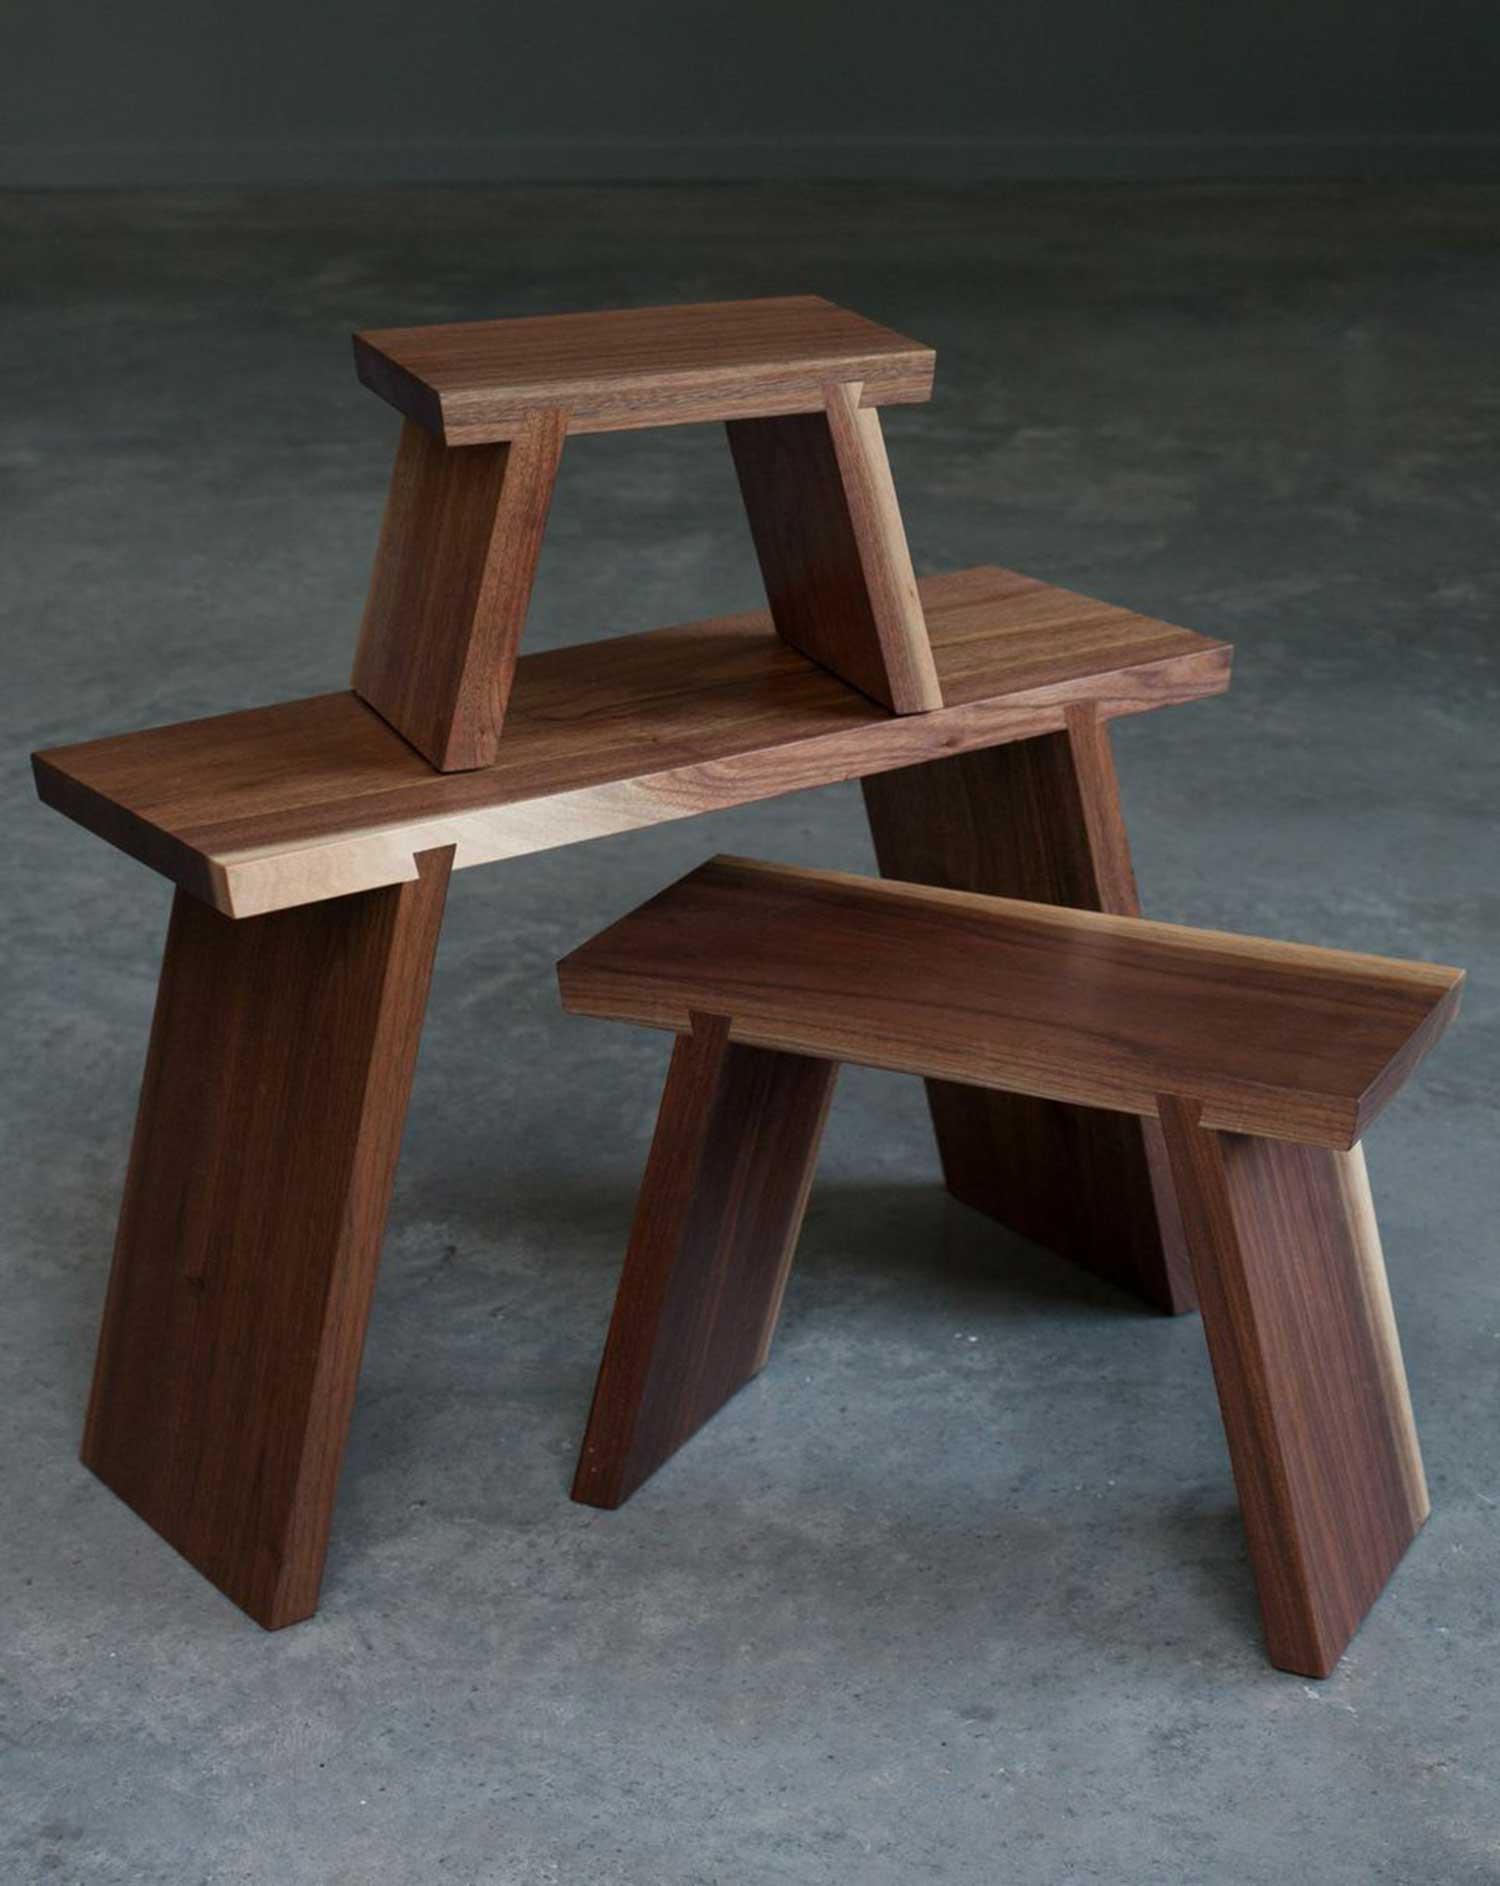 wickham_nesting_stools2_meredith_heuer_photography.jpg